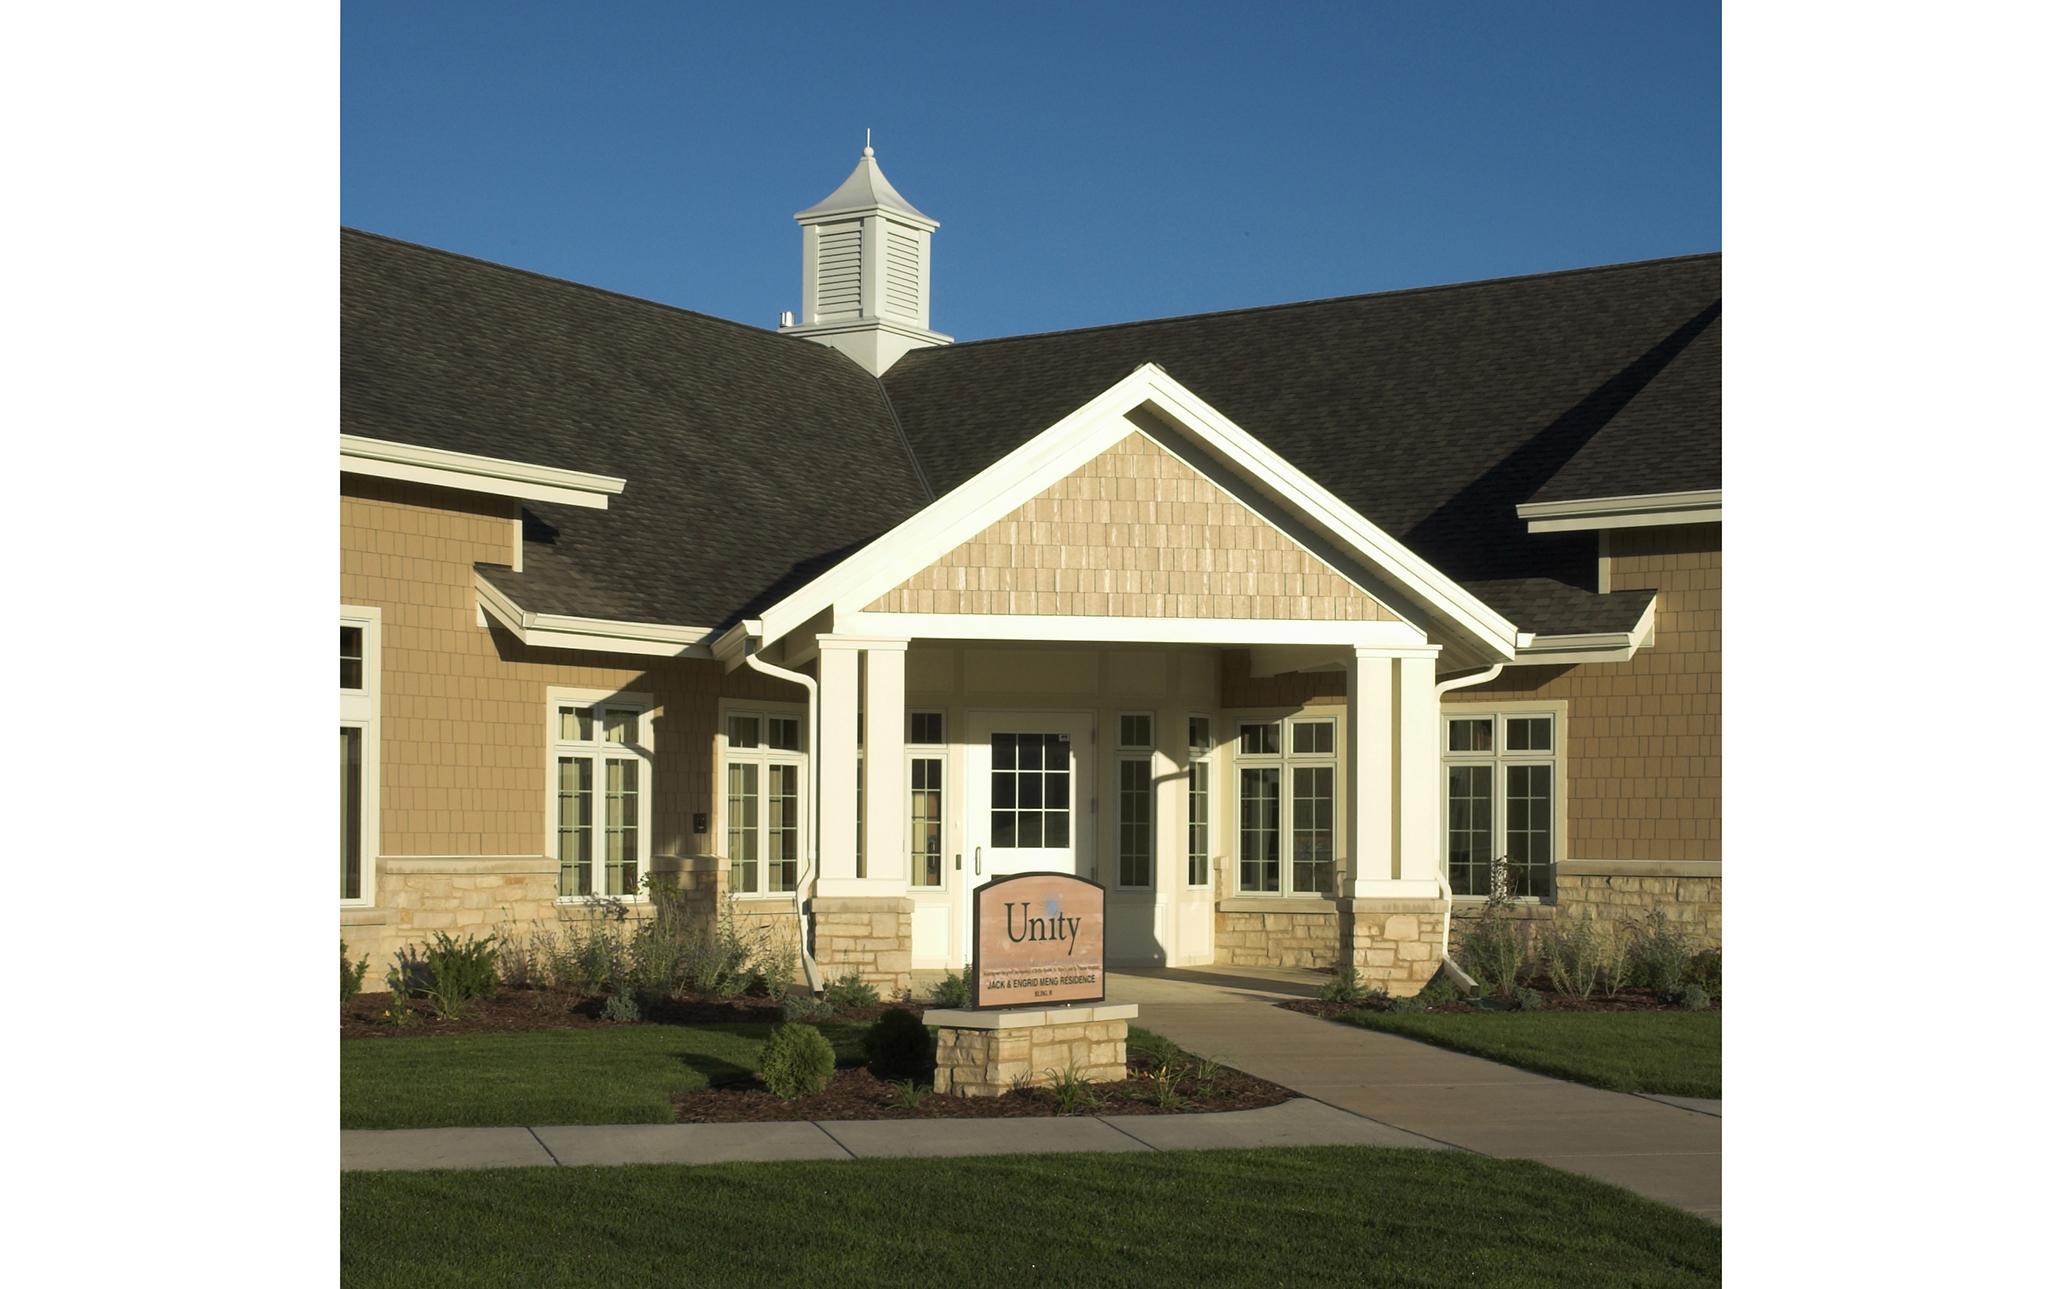 3_Unity-Hospice-Ledgeview-Campus